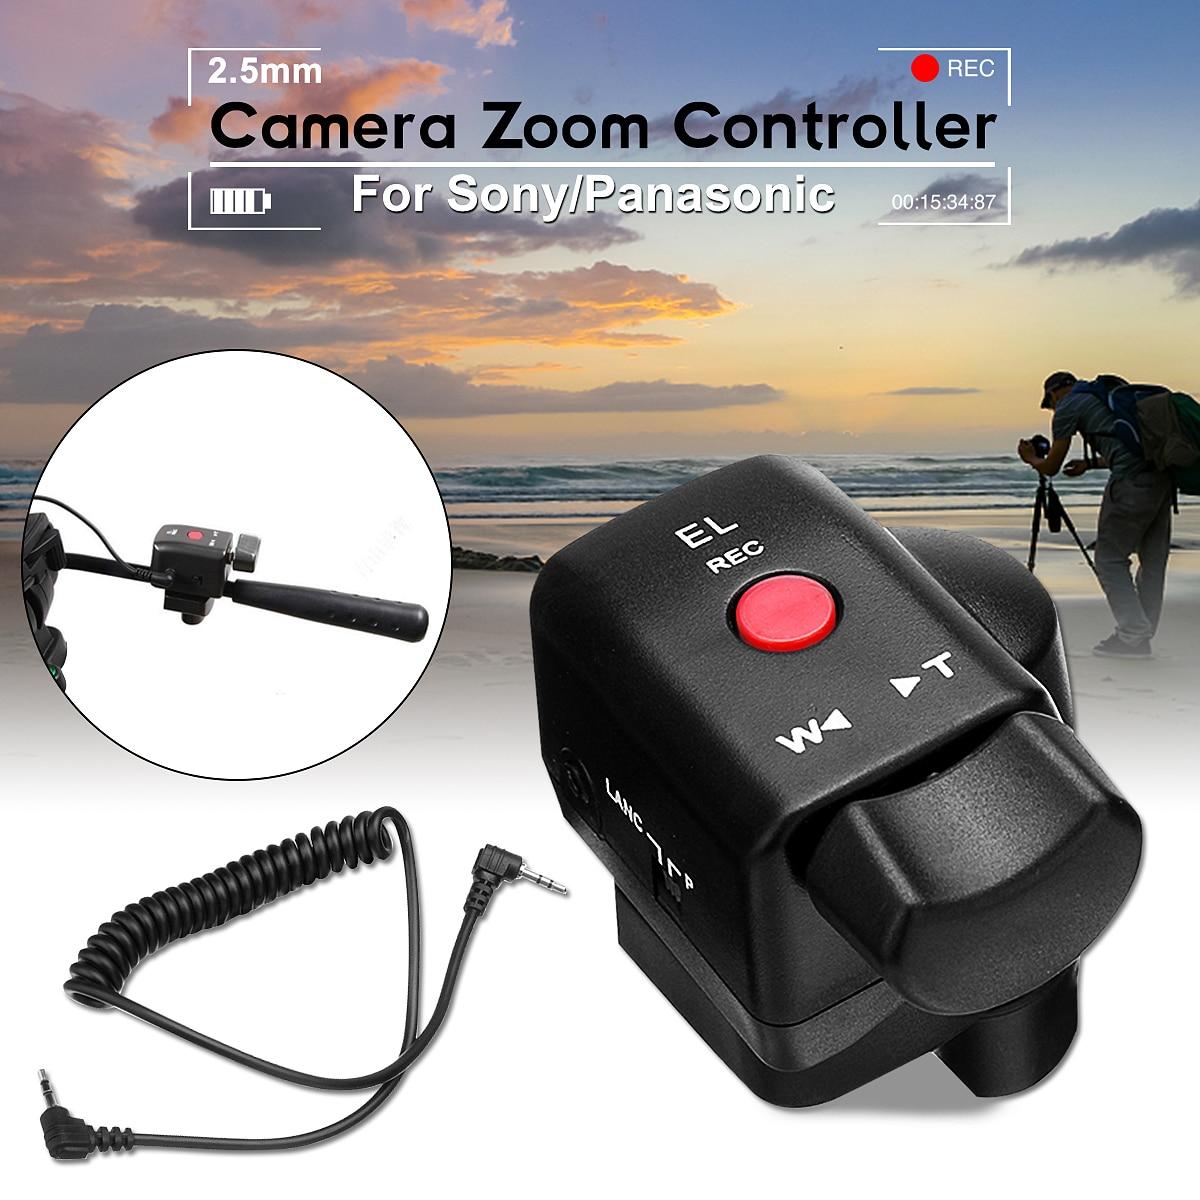 DSLR Pro Camcorder Remote Control Zoom Remote Controller